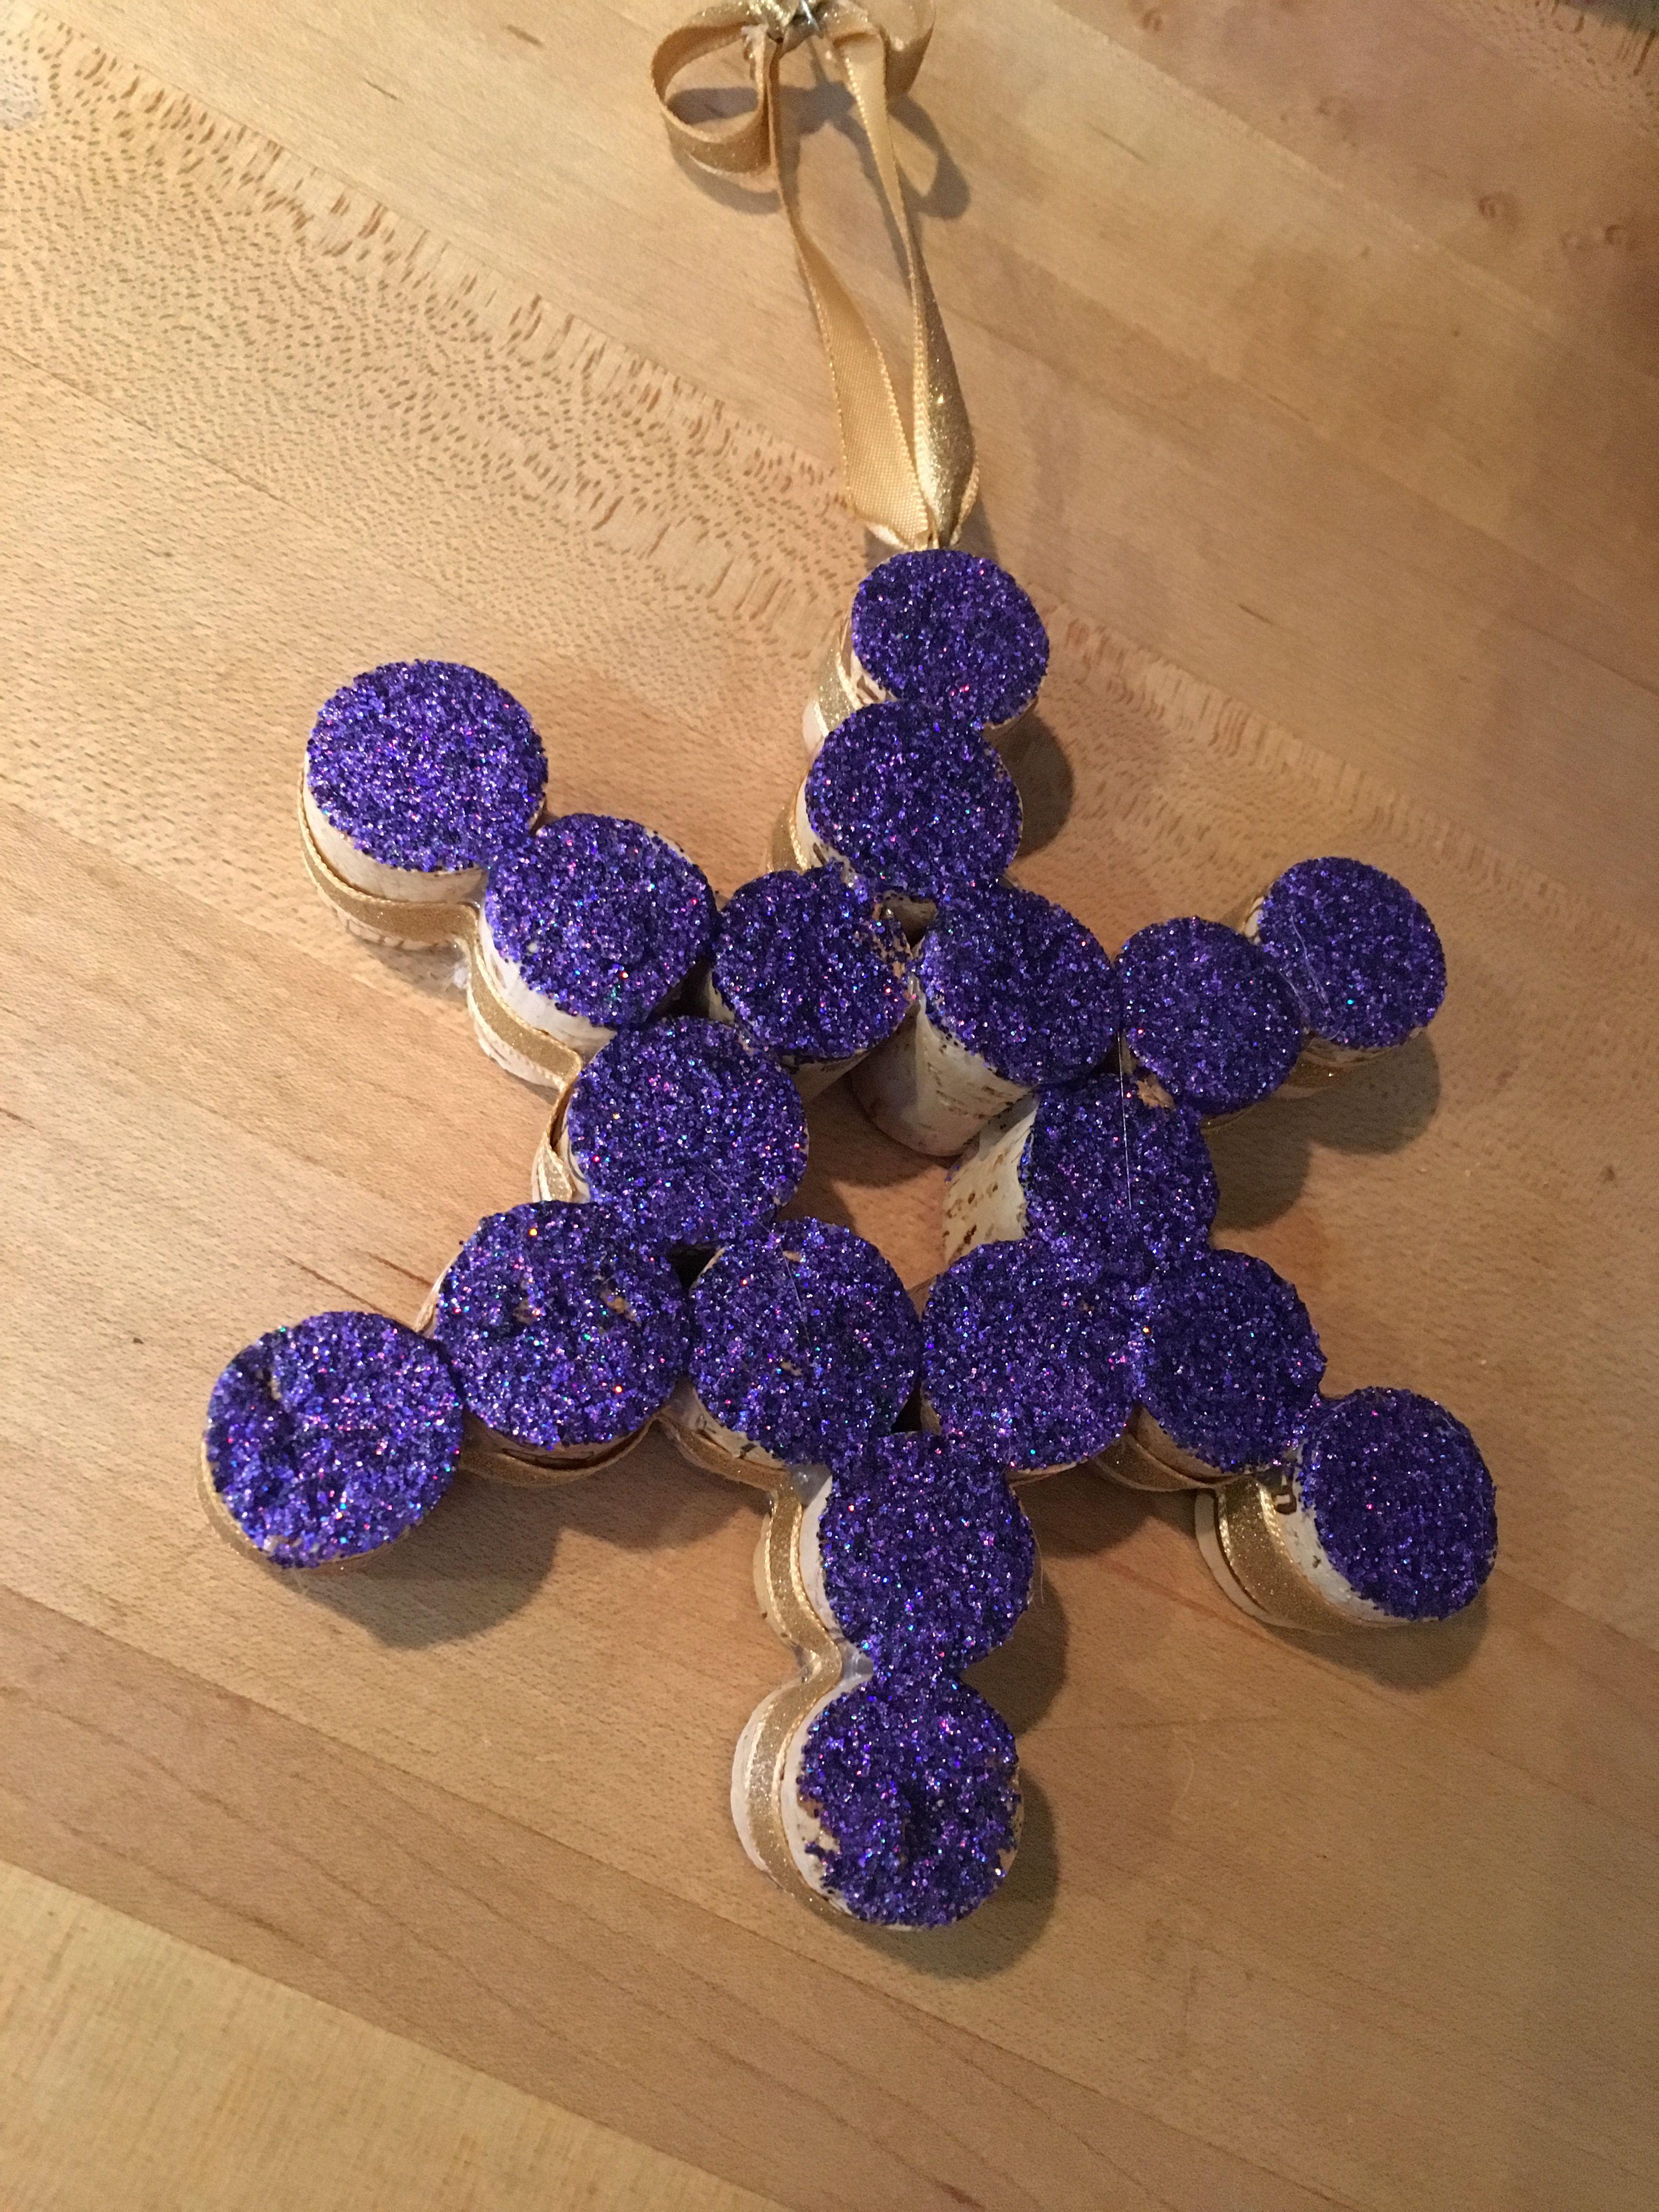 Wine cork snowflake ornament Snowflake ornaments